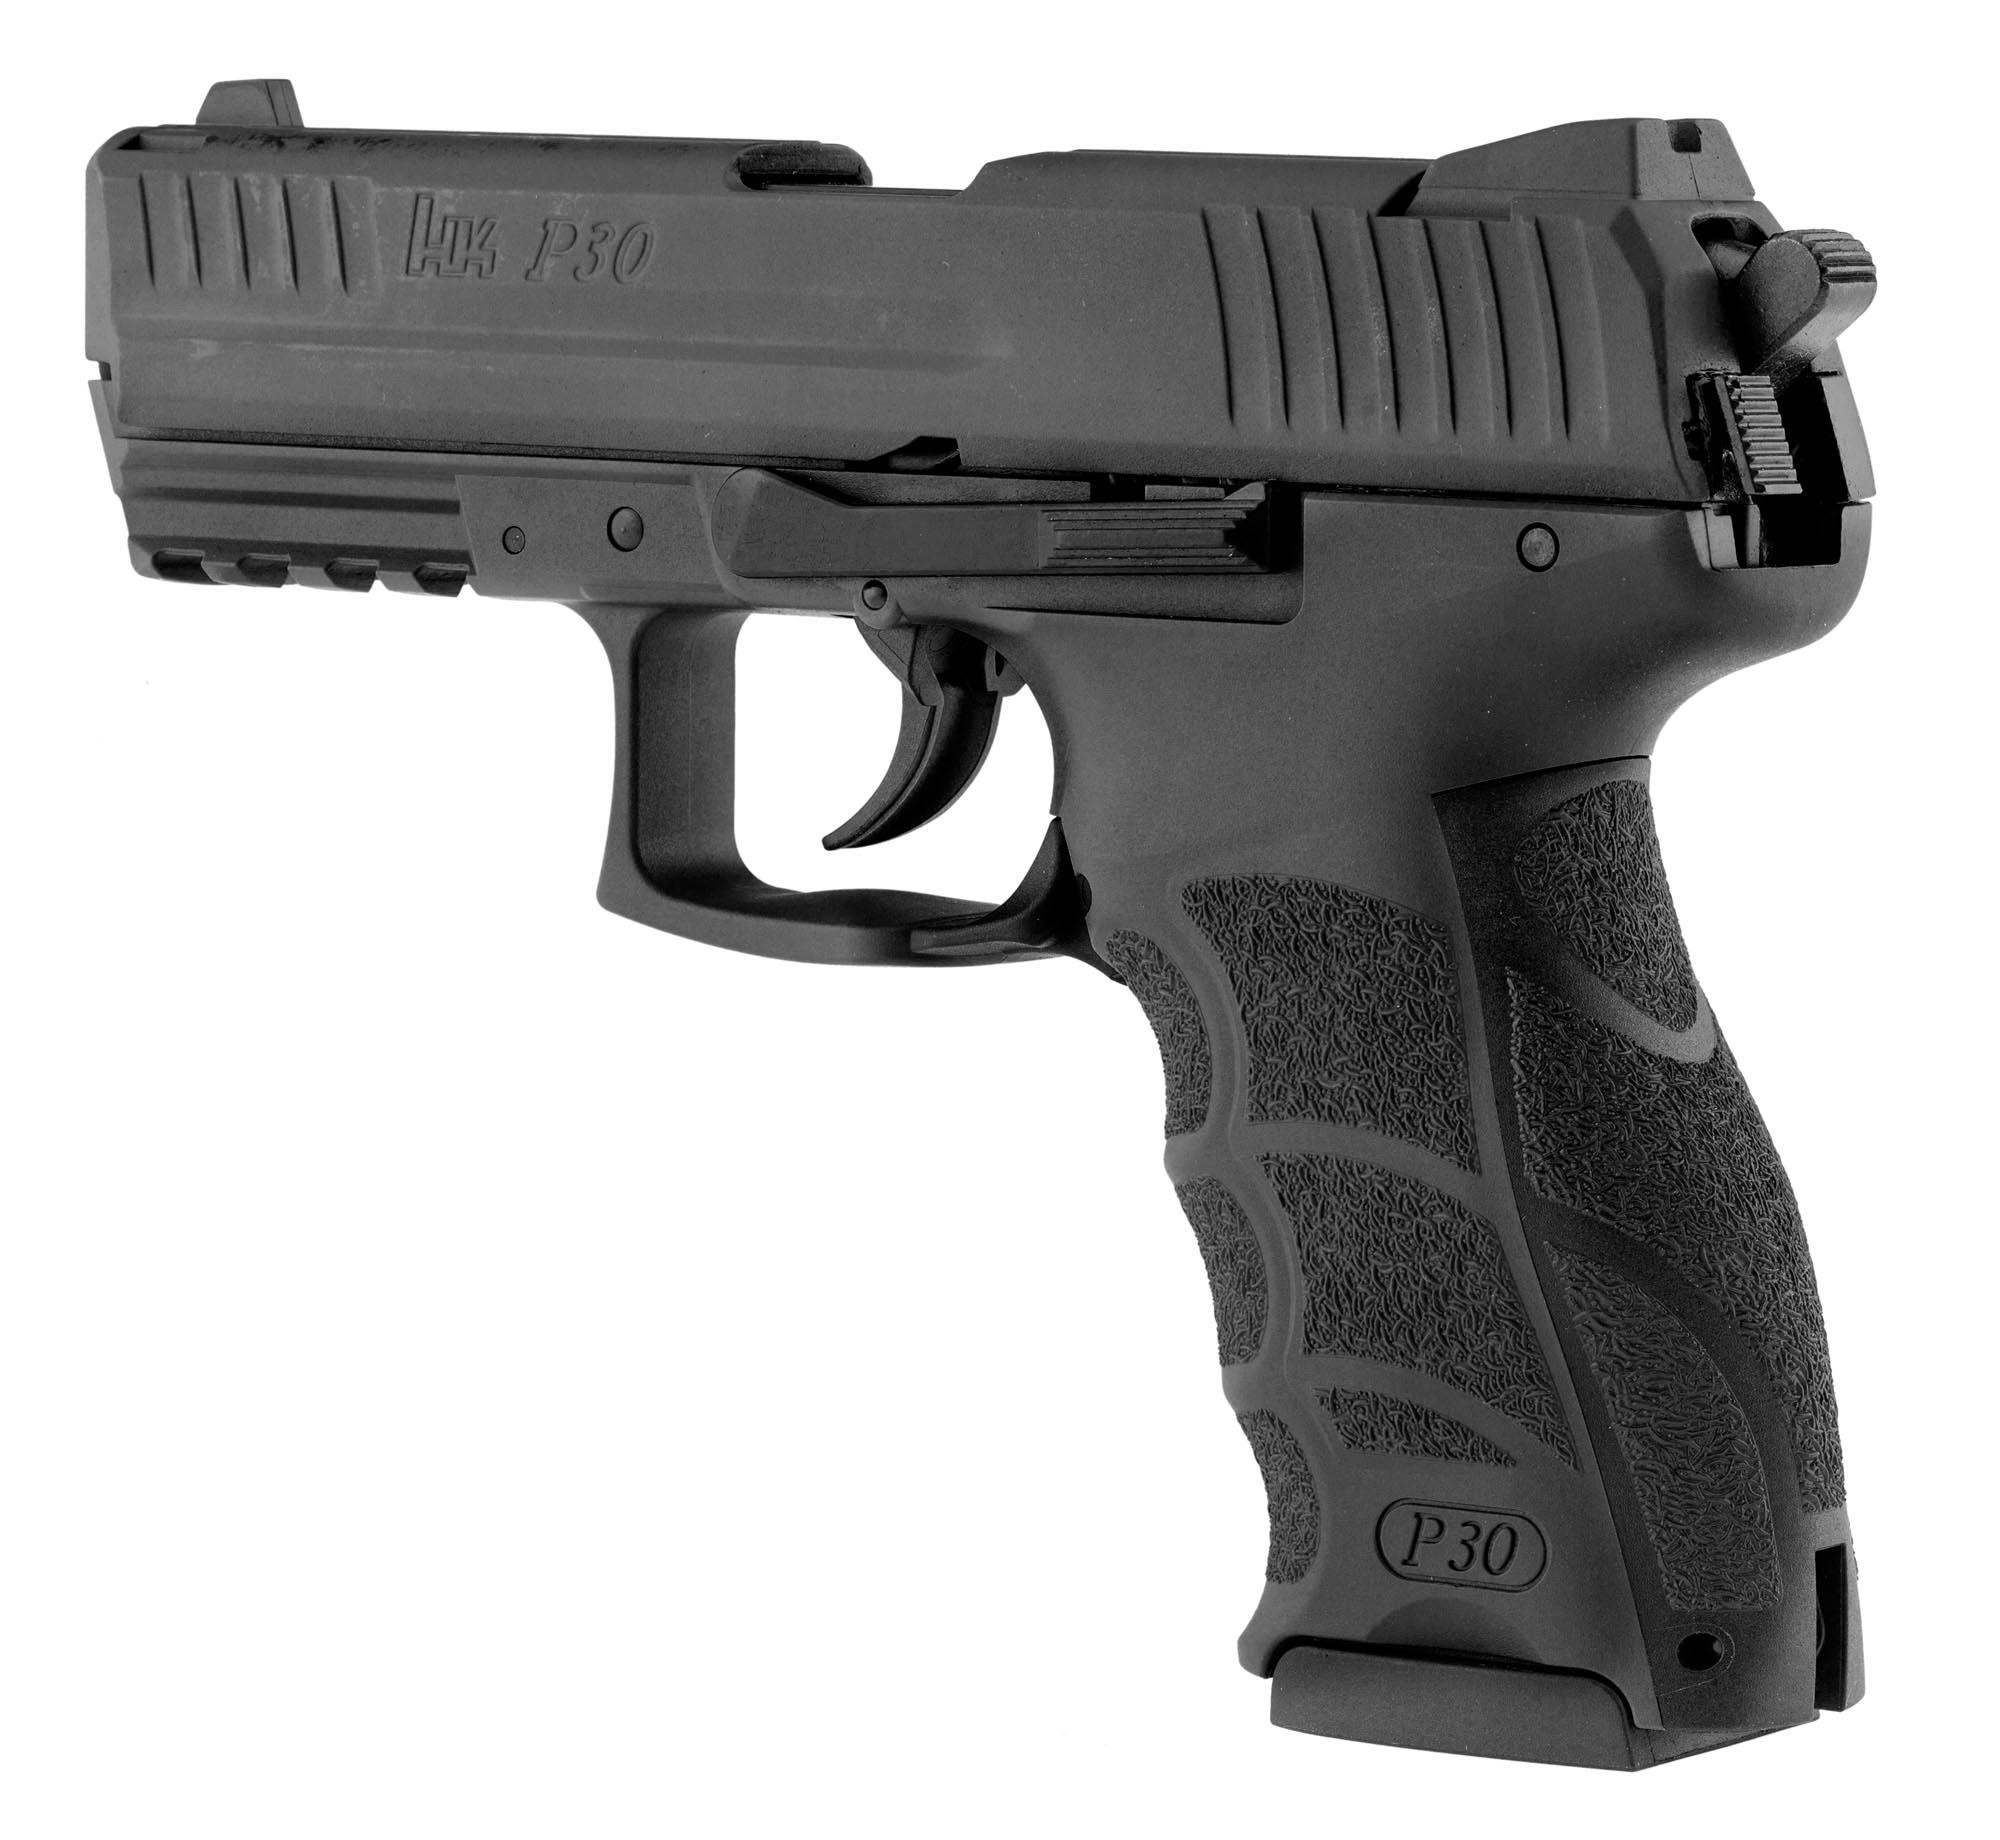 pistolet d 39 alarme hk p30 noir armes blanc et gaz. Black Bedroom Furniture Sets. Home Design Ideas